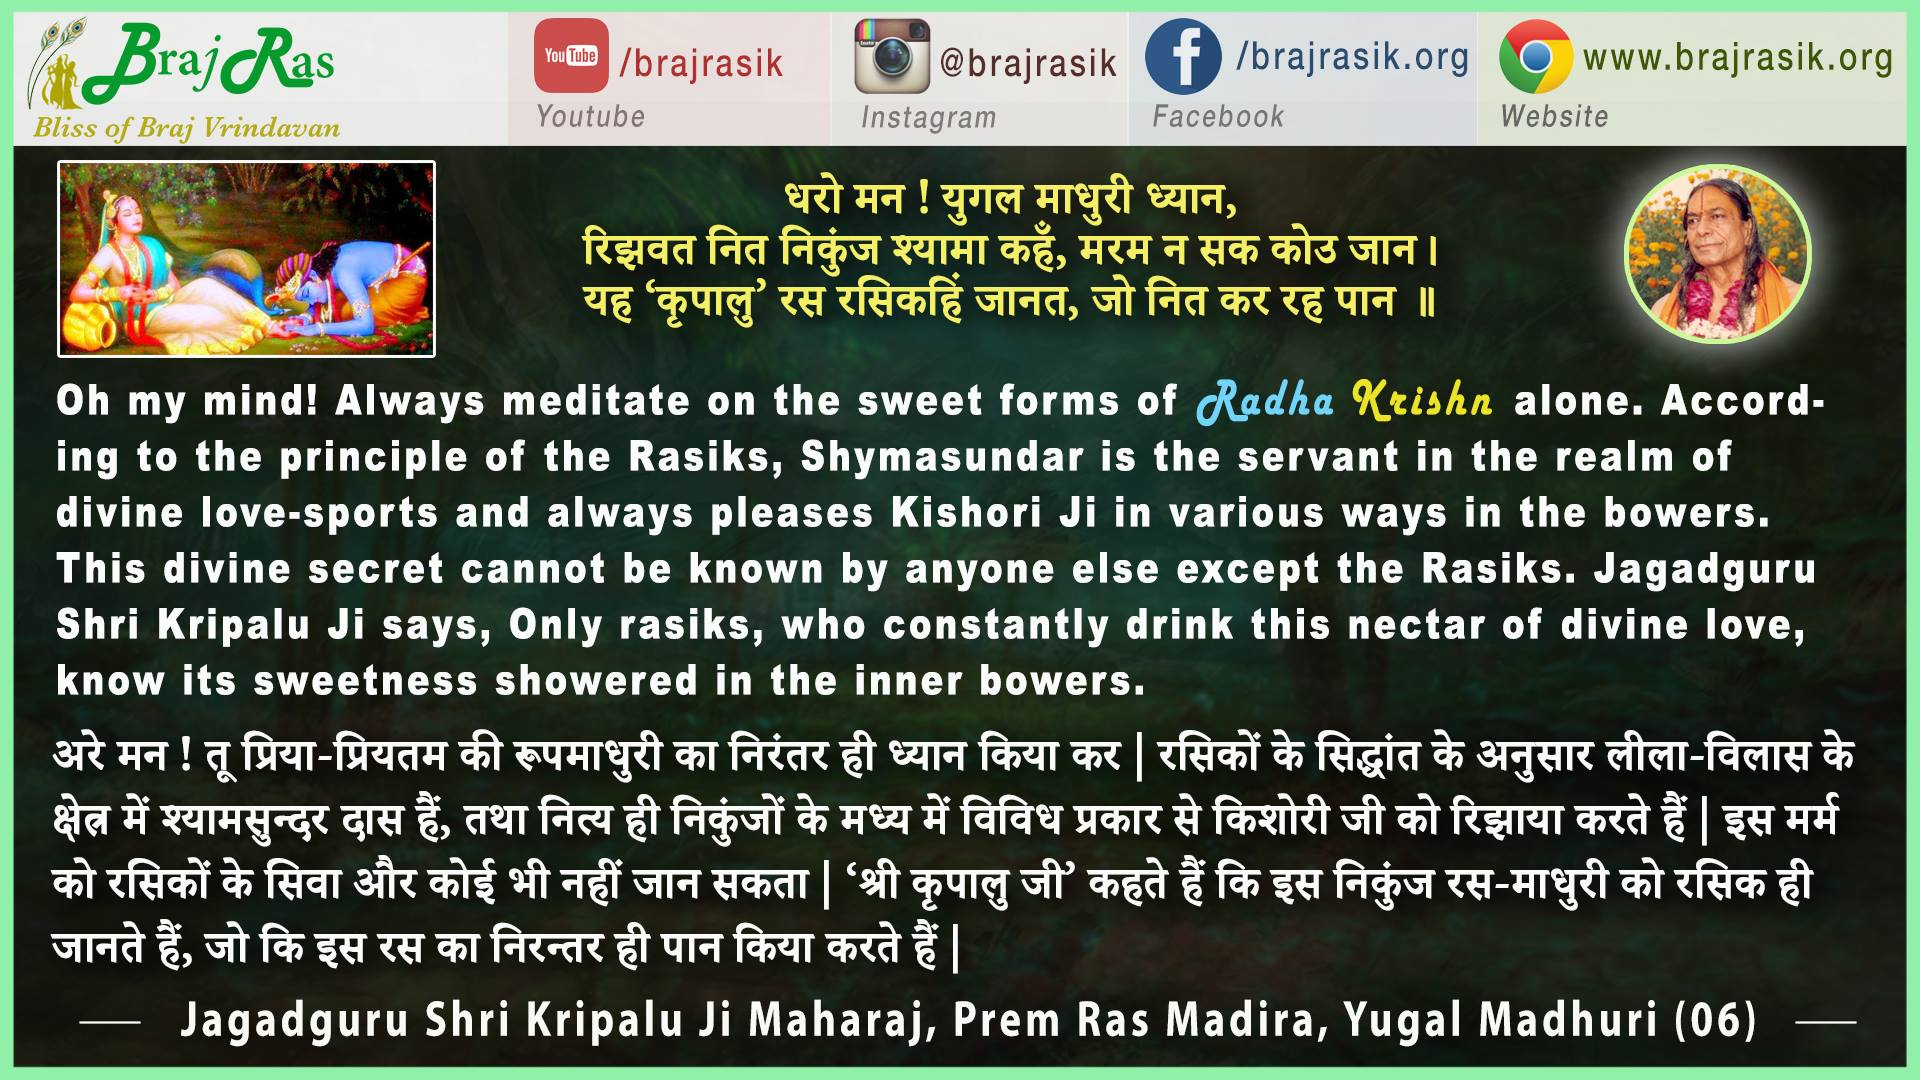 Dharo Man ! Yugal Madhuri Dhyaan - Jagadguru Shri Kripalu Ji Maharaj, Prem Ras Madira, Yugal Madhuri (06)